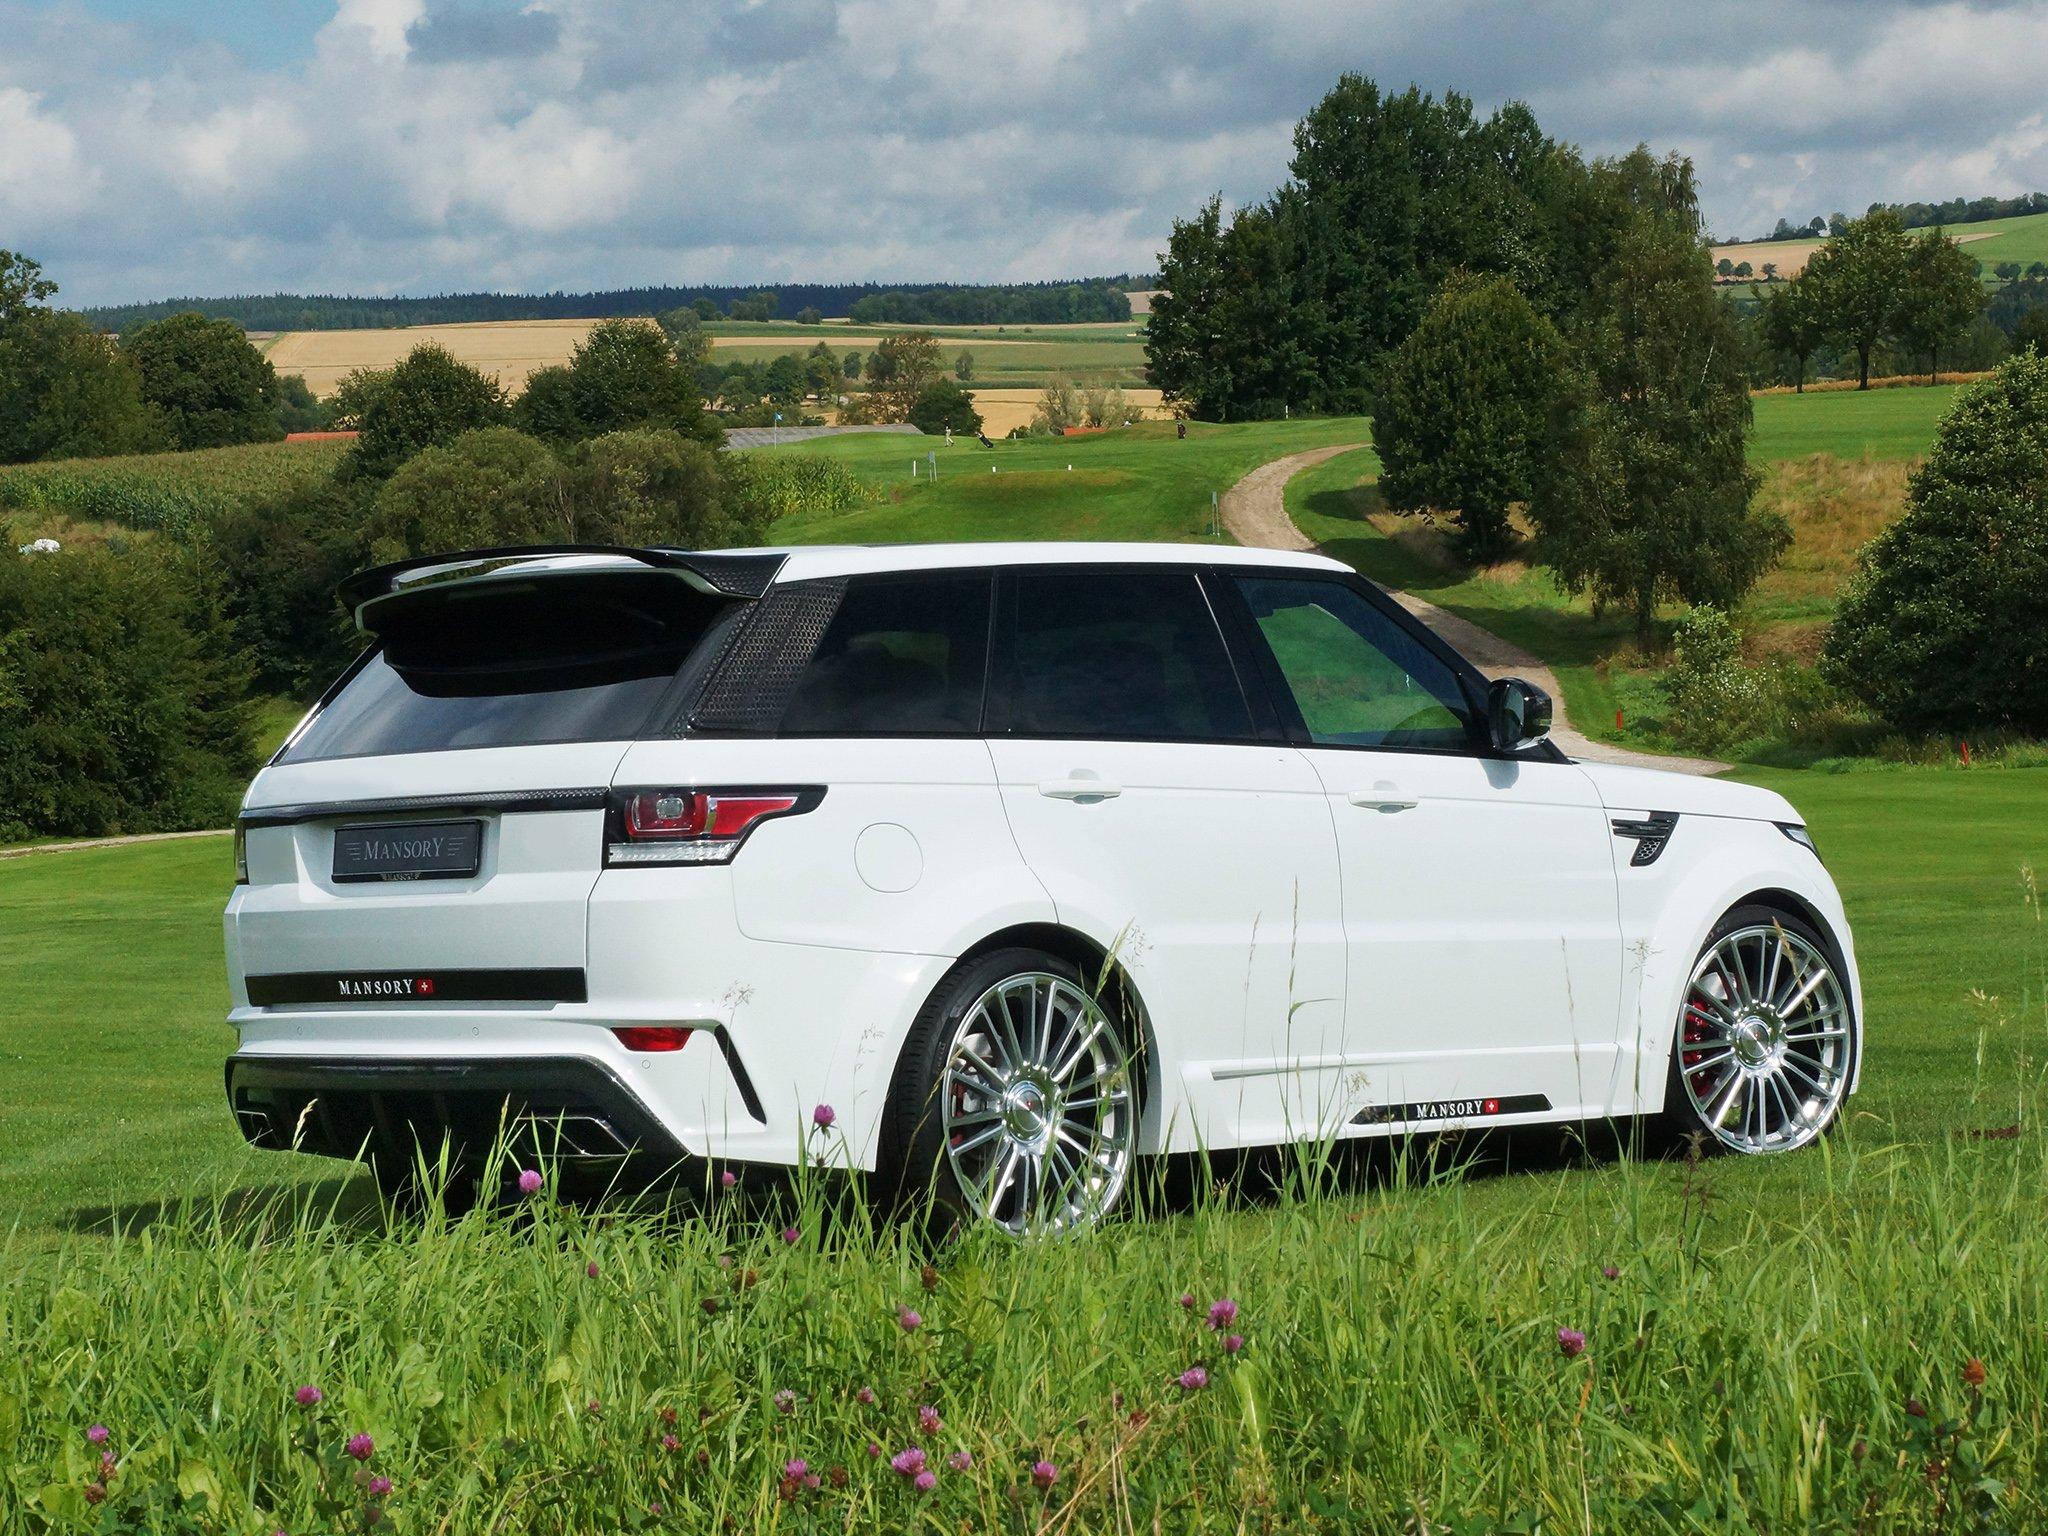 2014 mansory range rover sport tuning luxury suv wallpaper 2048x1536 452770 wallpaperup